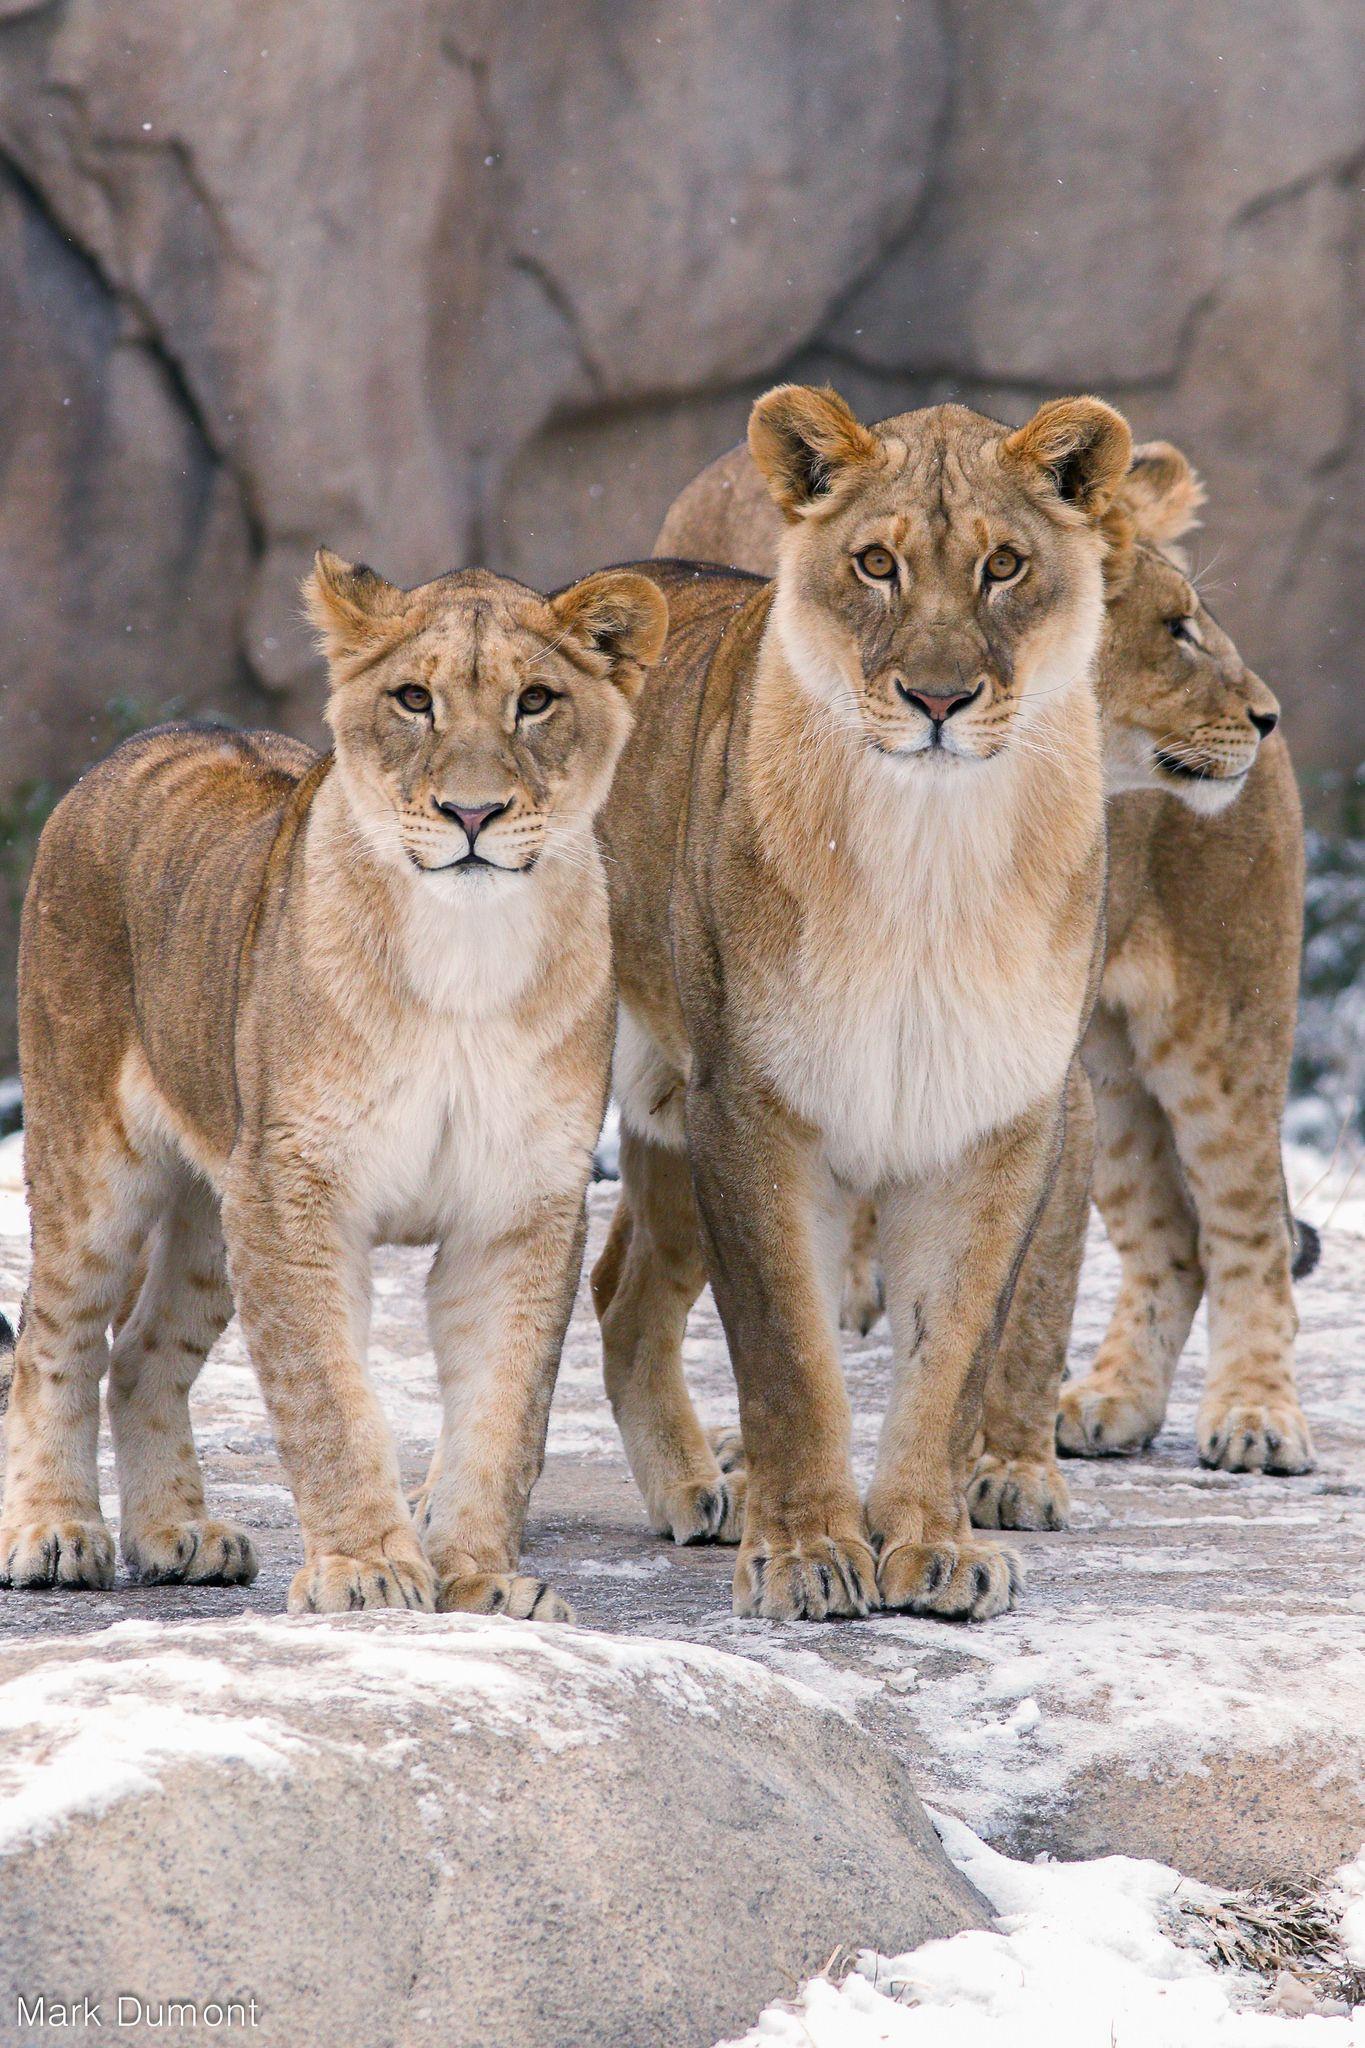 234A6558Edit.jpg Cincinnati zoo, Wildlife animals, Big cats